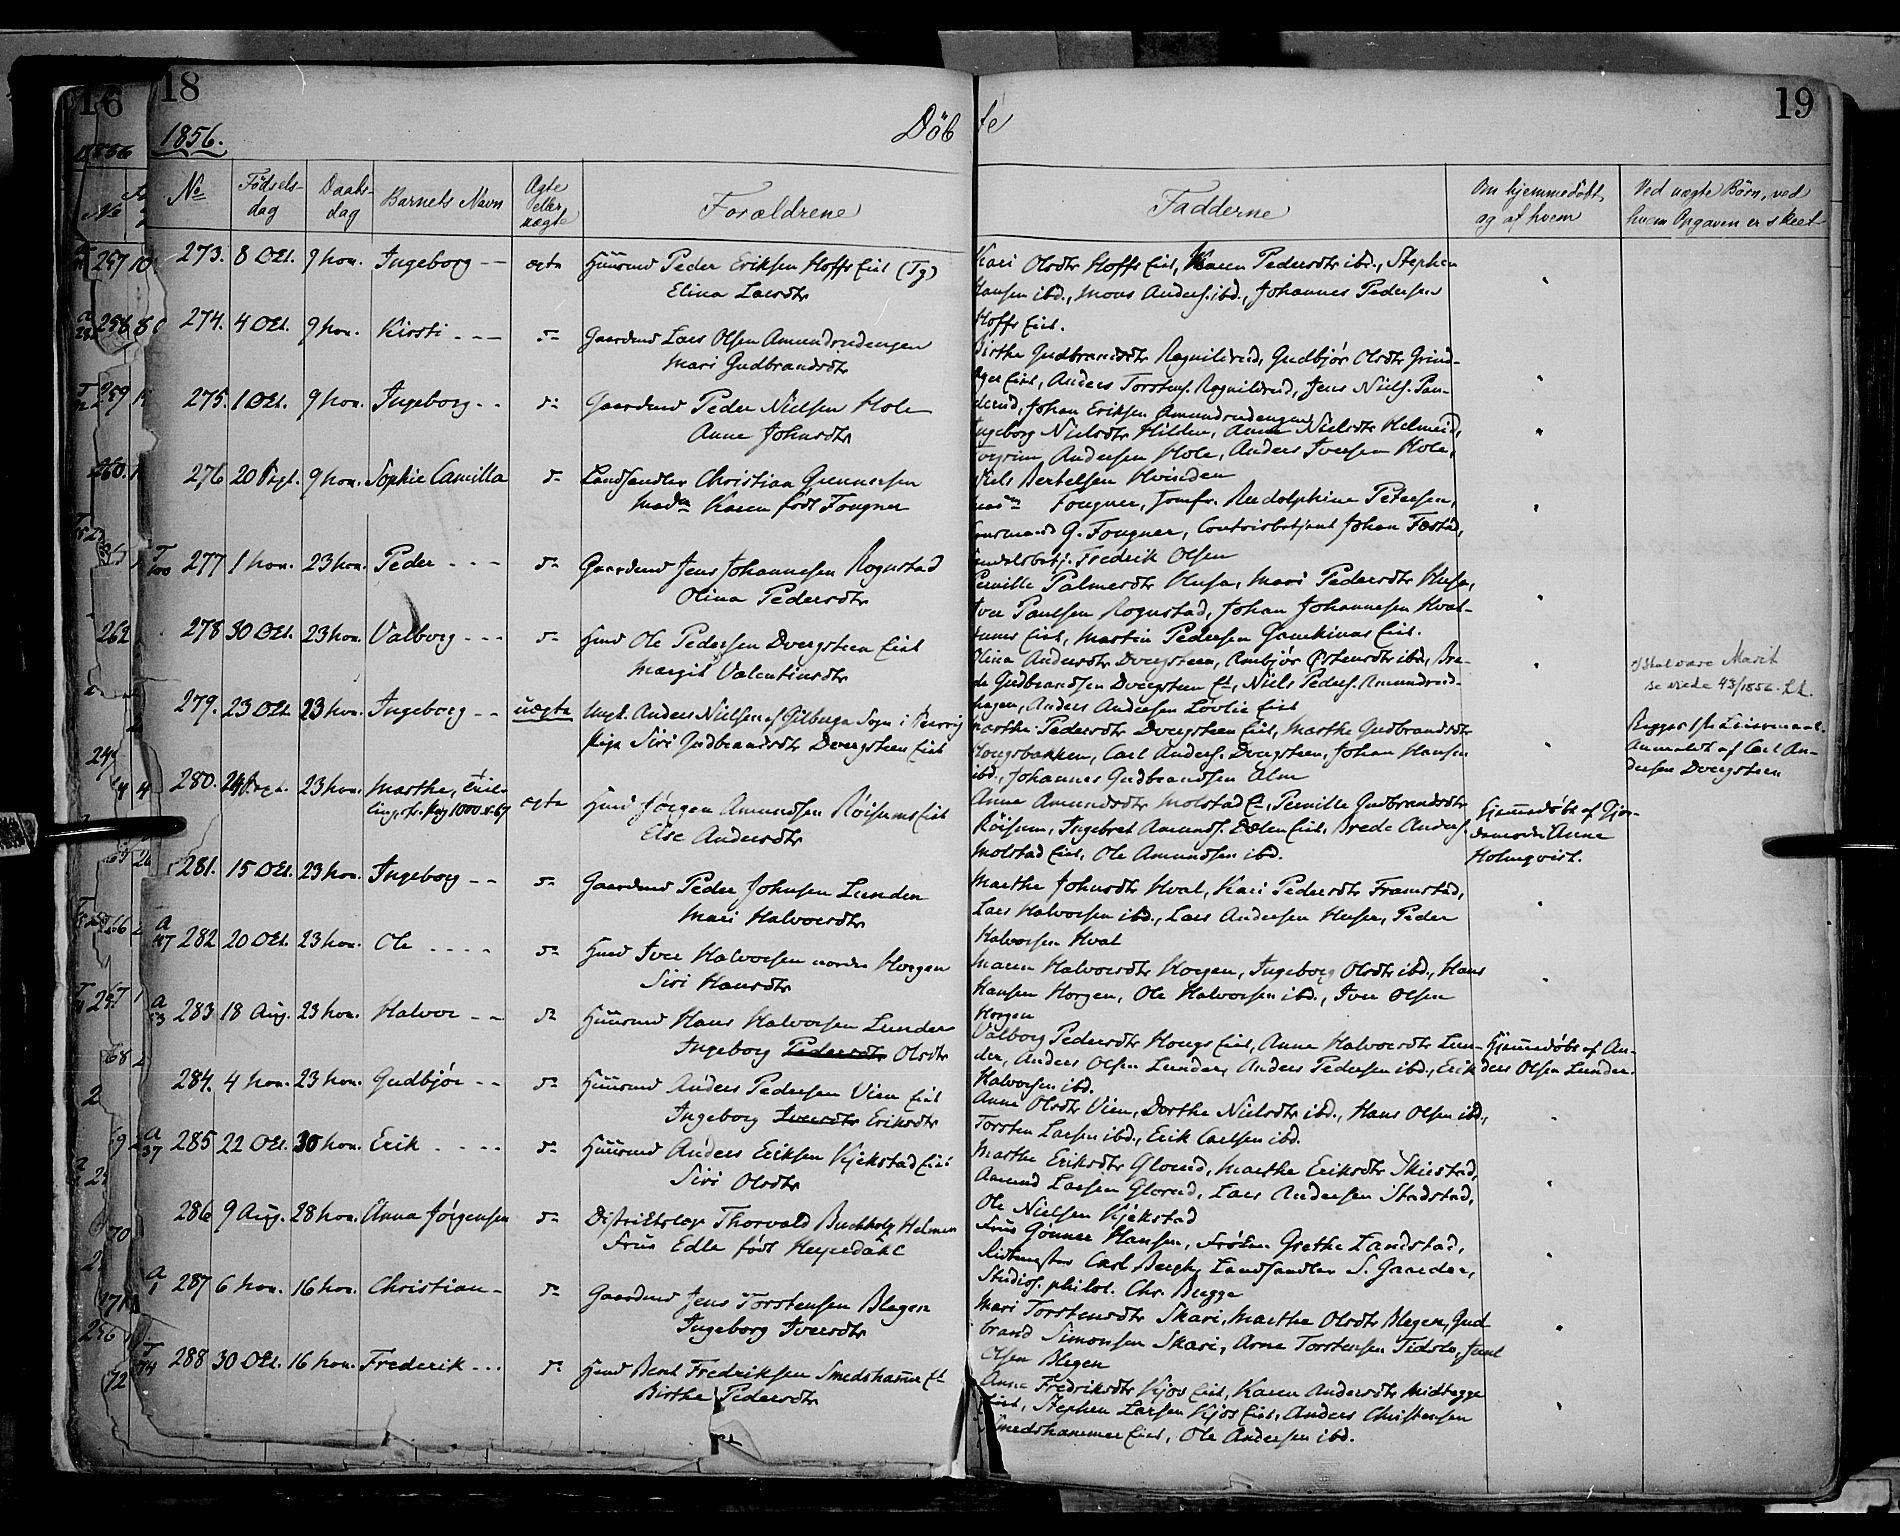 SAH, Gran prestekontor, Ministerialbok nr. 12, 1856-1874, s. 18-19